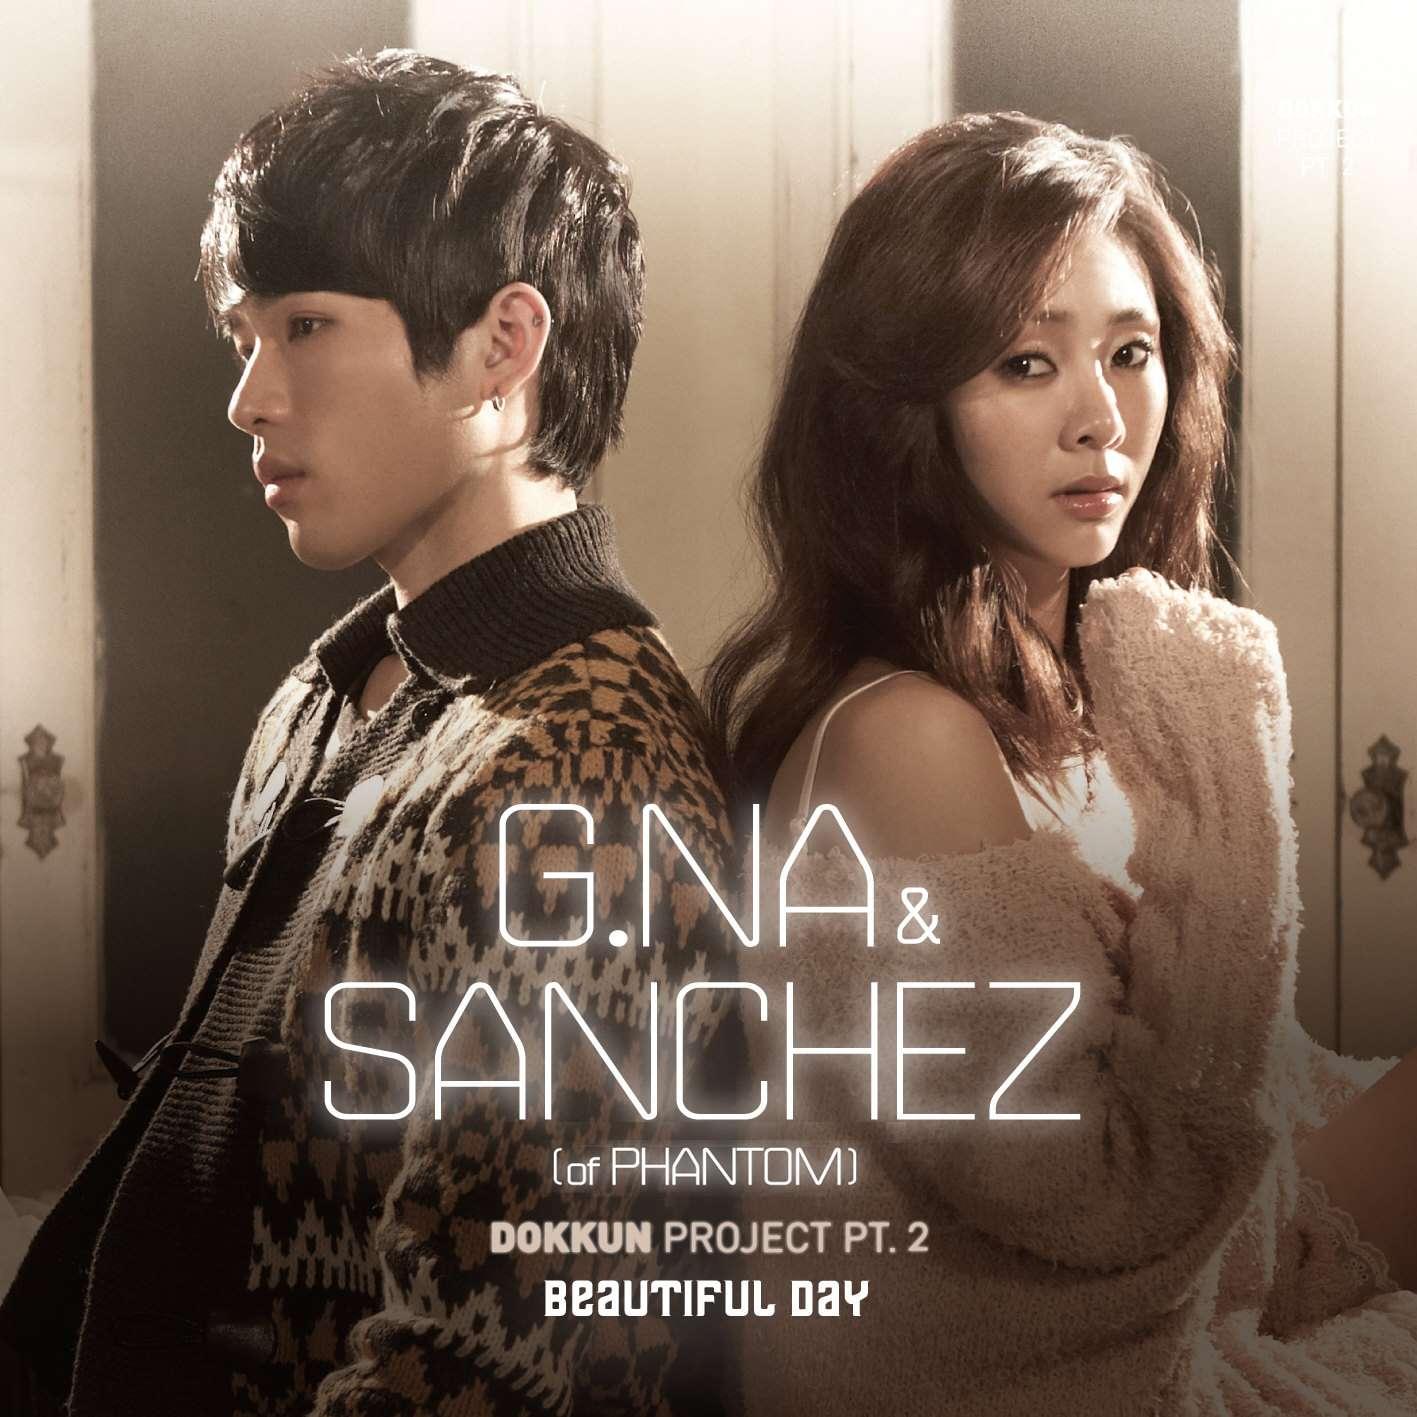 [Single] G.NA & Sanchez - Beautiful Day (Dokkun Project Pt.2)